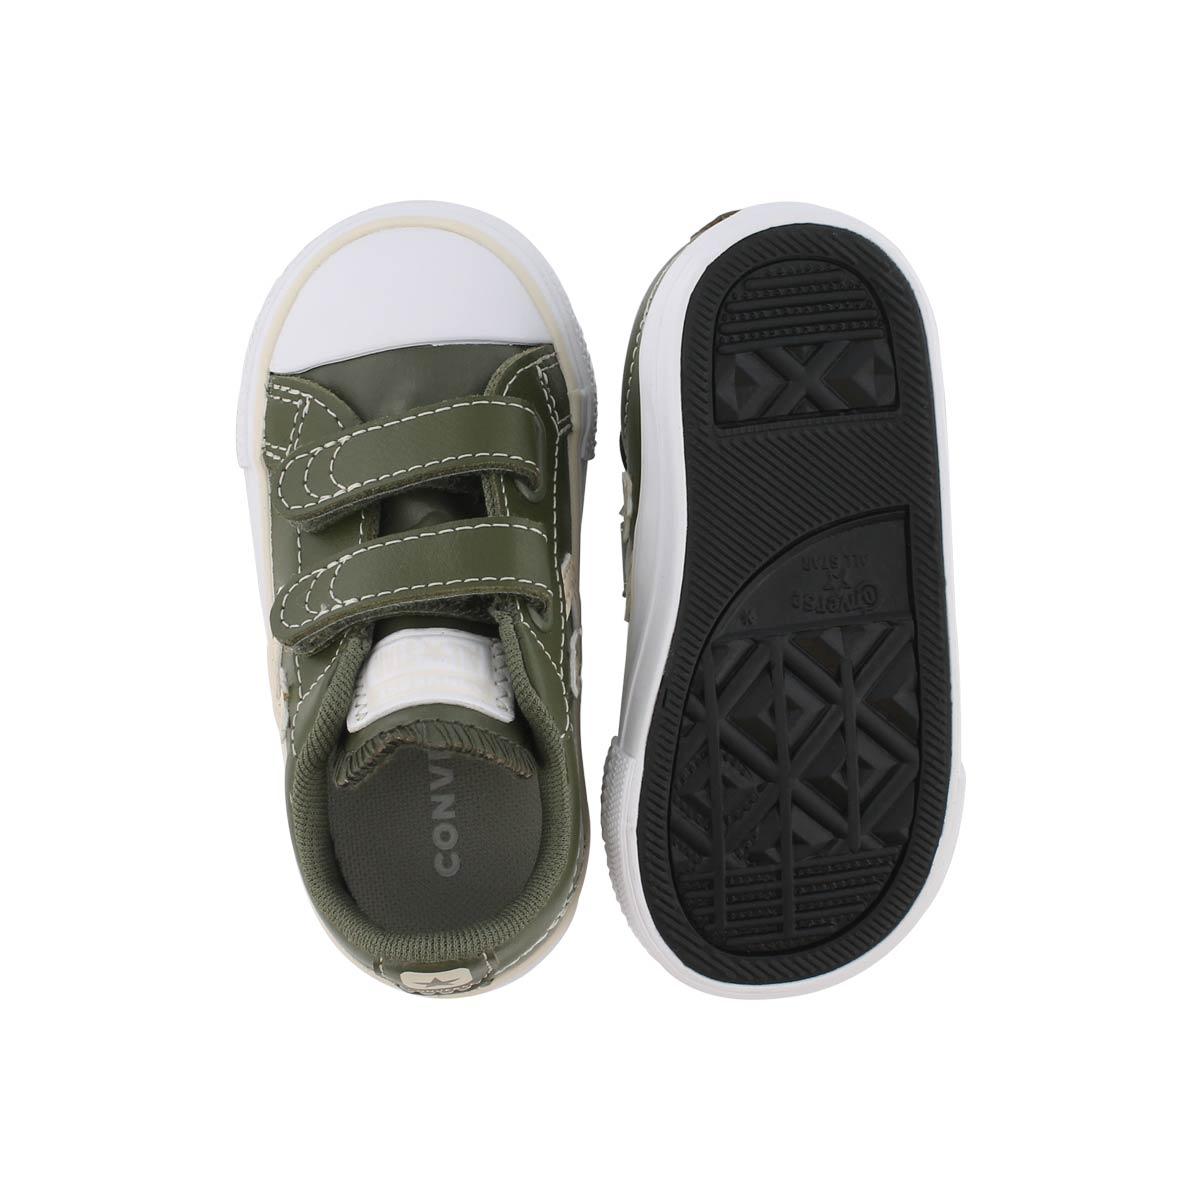 Infs-b CT Star Player 2V field sneaker